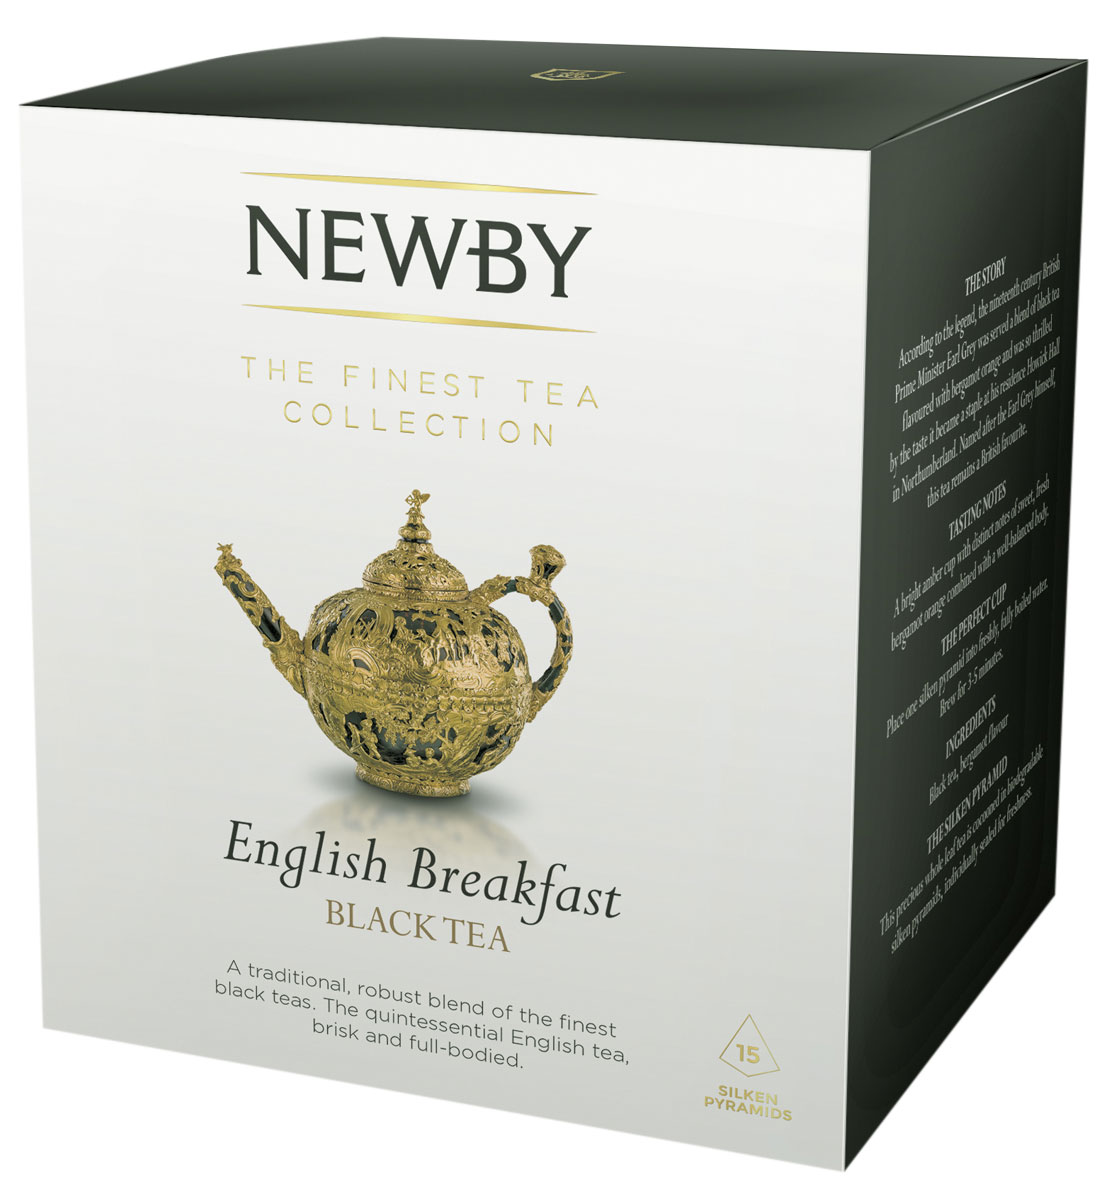 Newby English Breakfast черный чай в пирамидках, 15 шт newby masala chai черный листовой чай со специями в пирамидках 15 шт